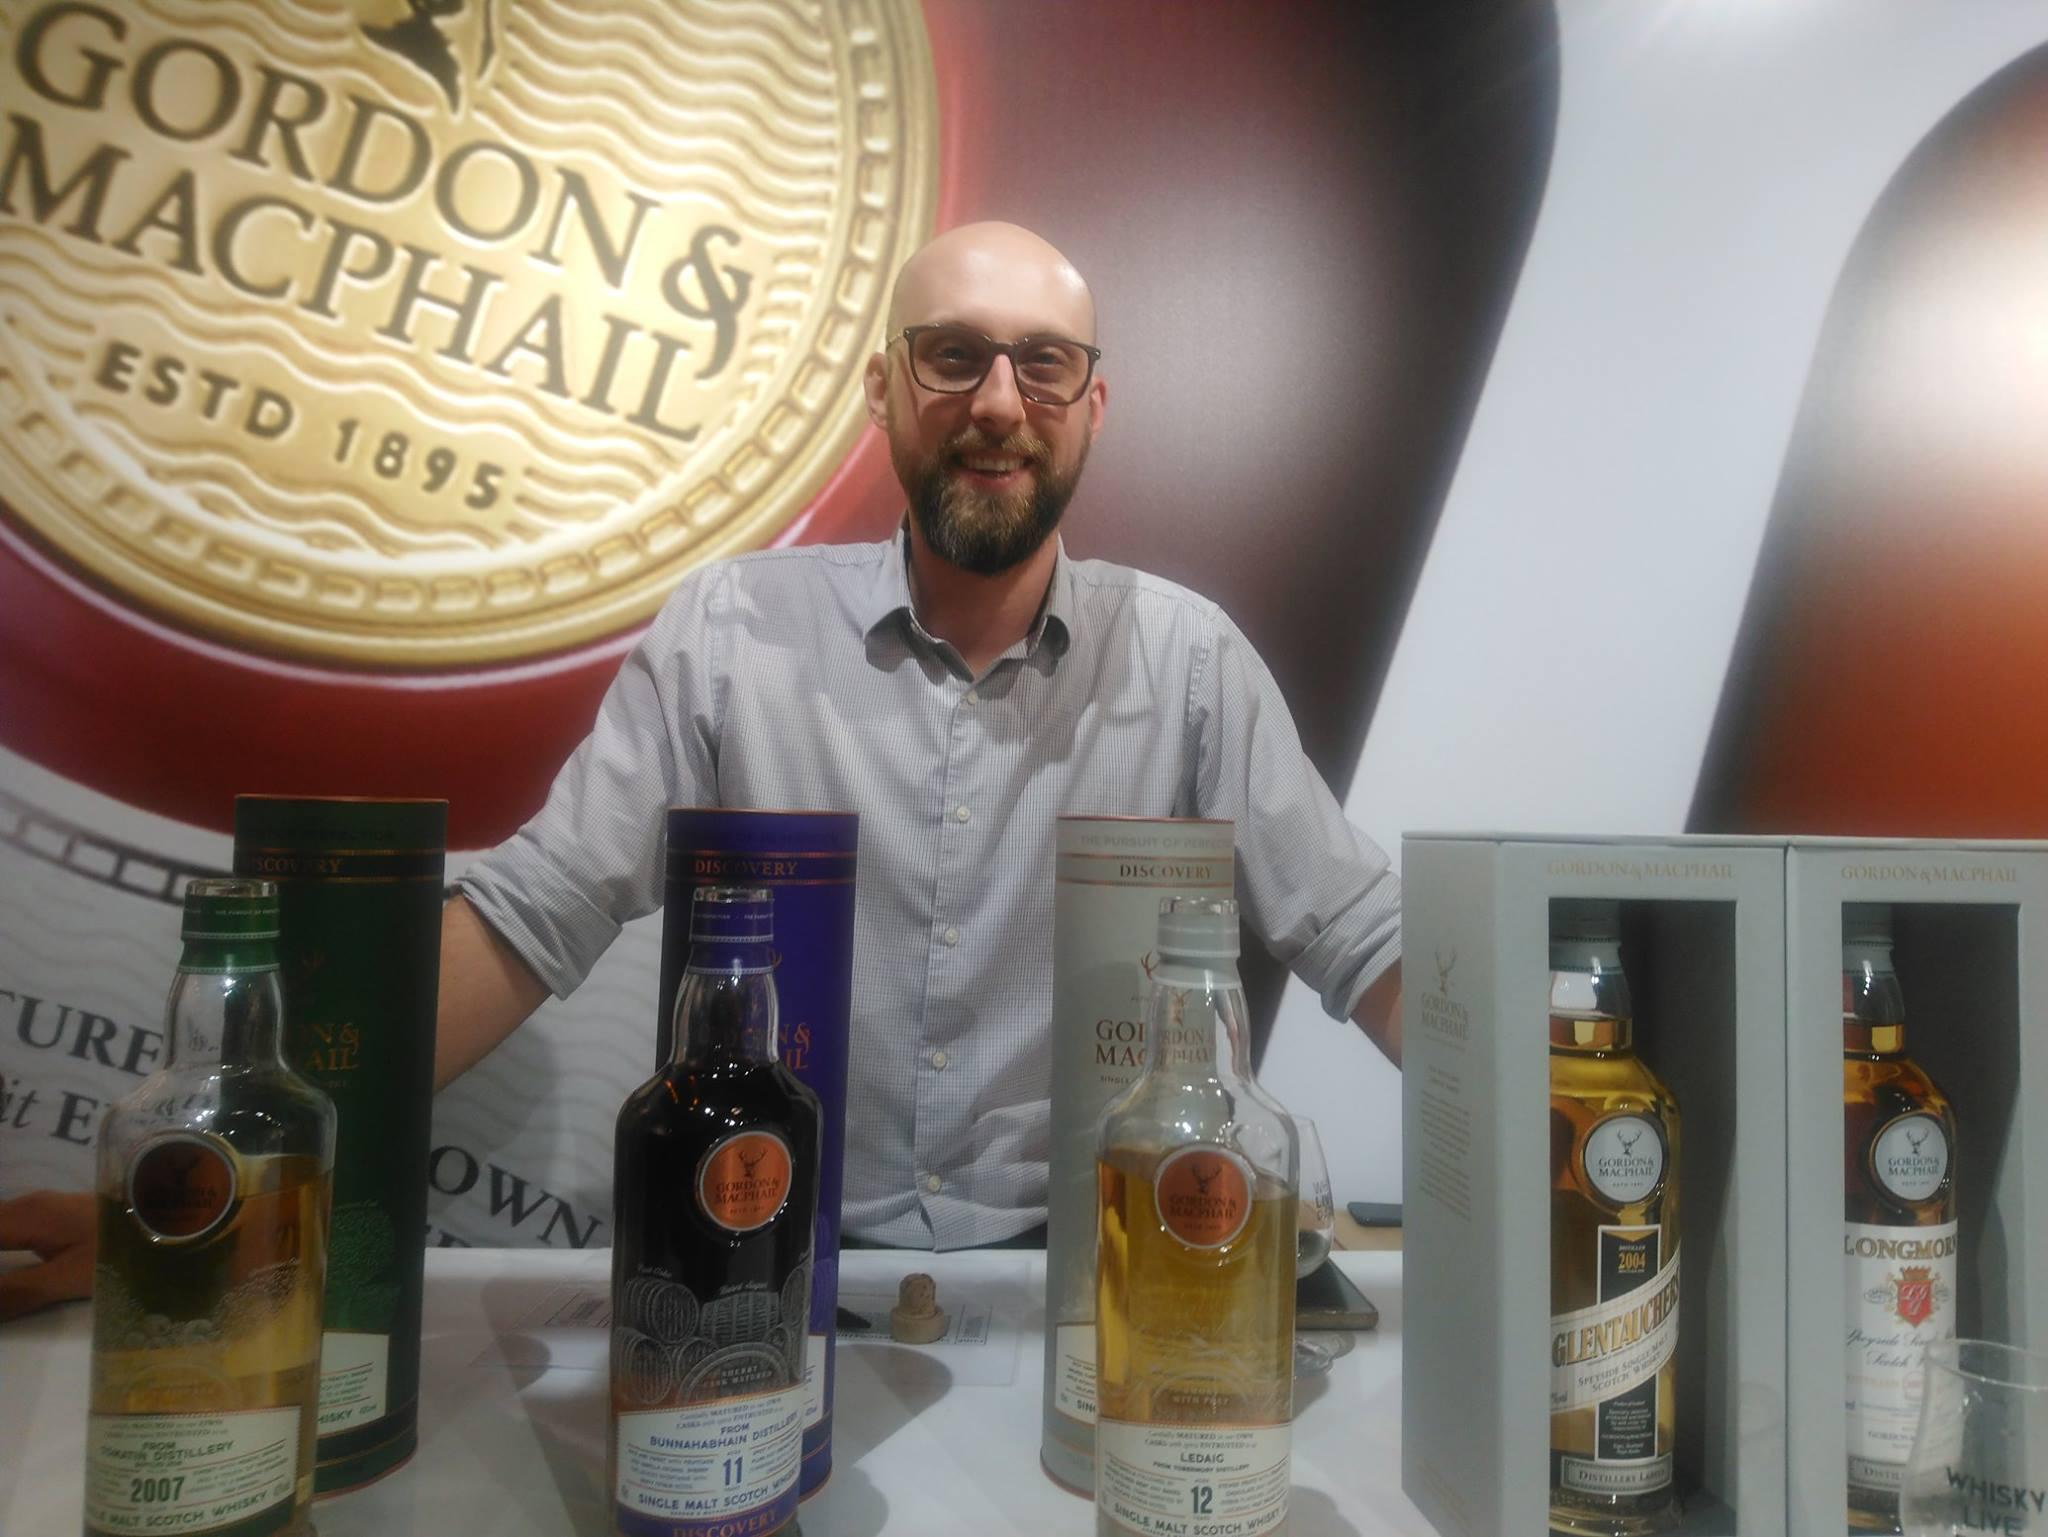 Gordon & MacPhail - Whisky Live 2018